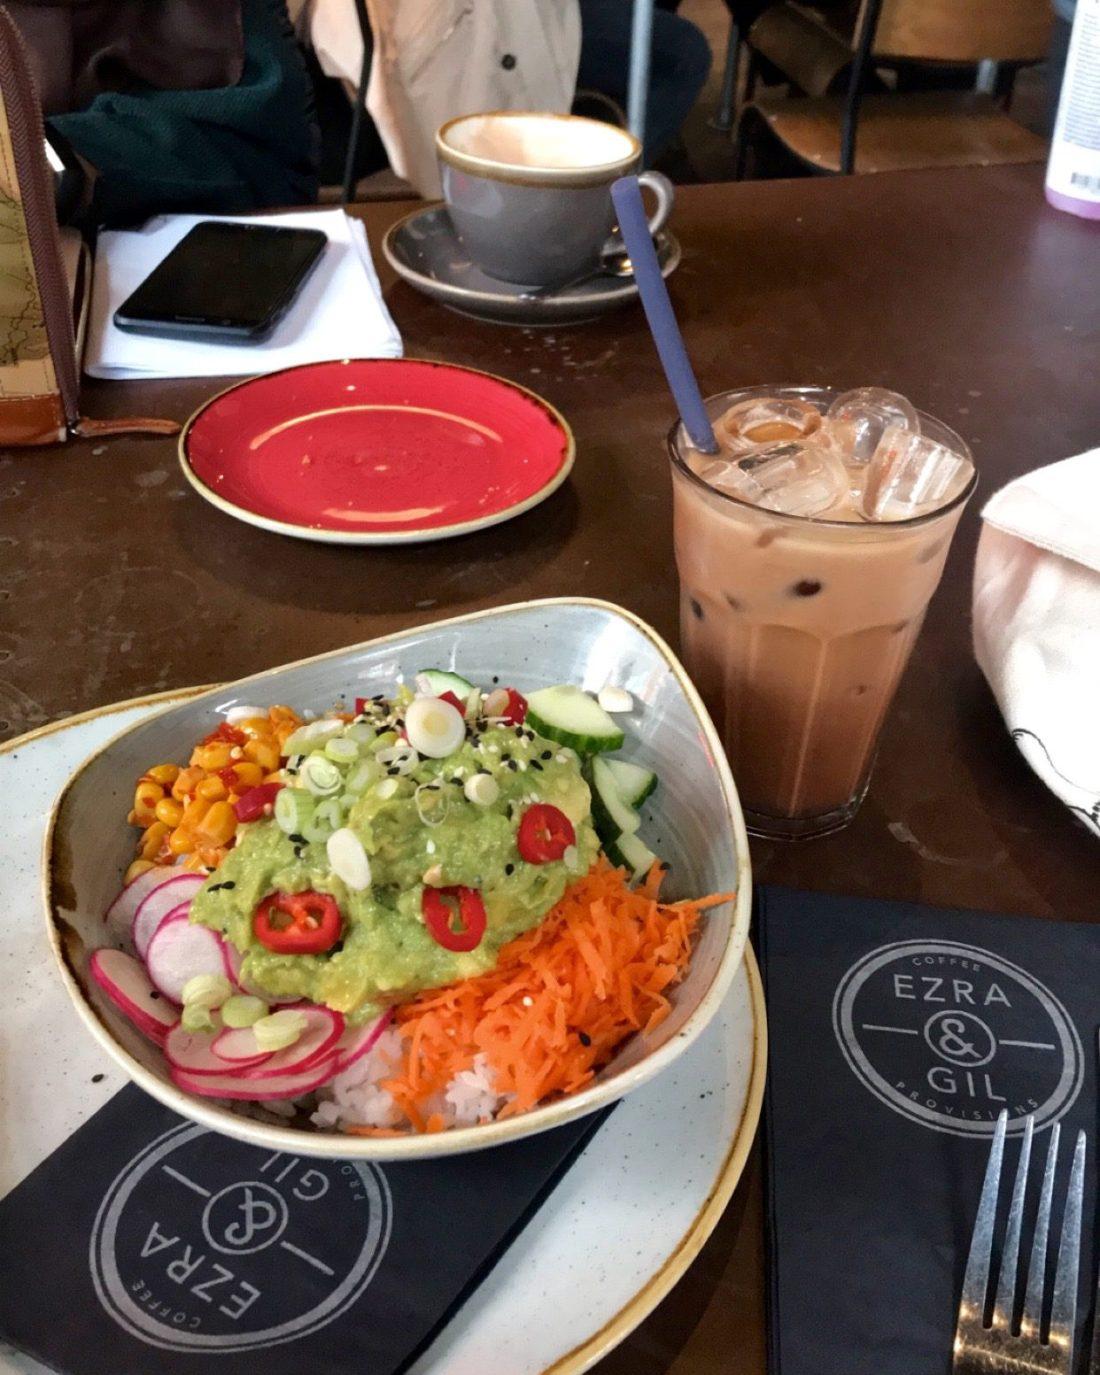 The Best Vegan Friendly Restaurants in Manchester, Ezra & Gil, Nishi V